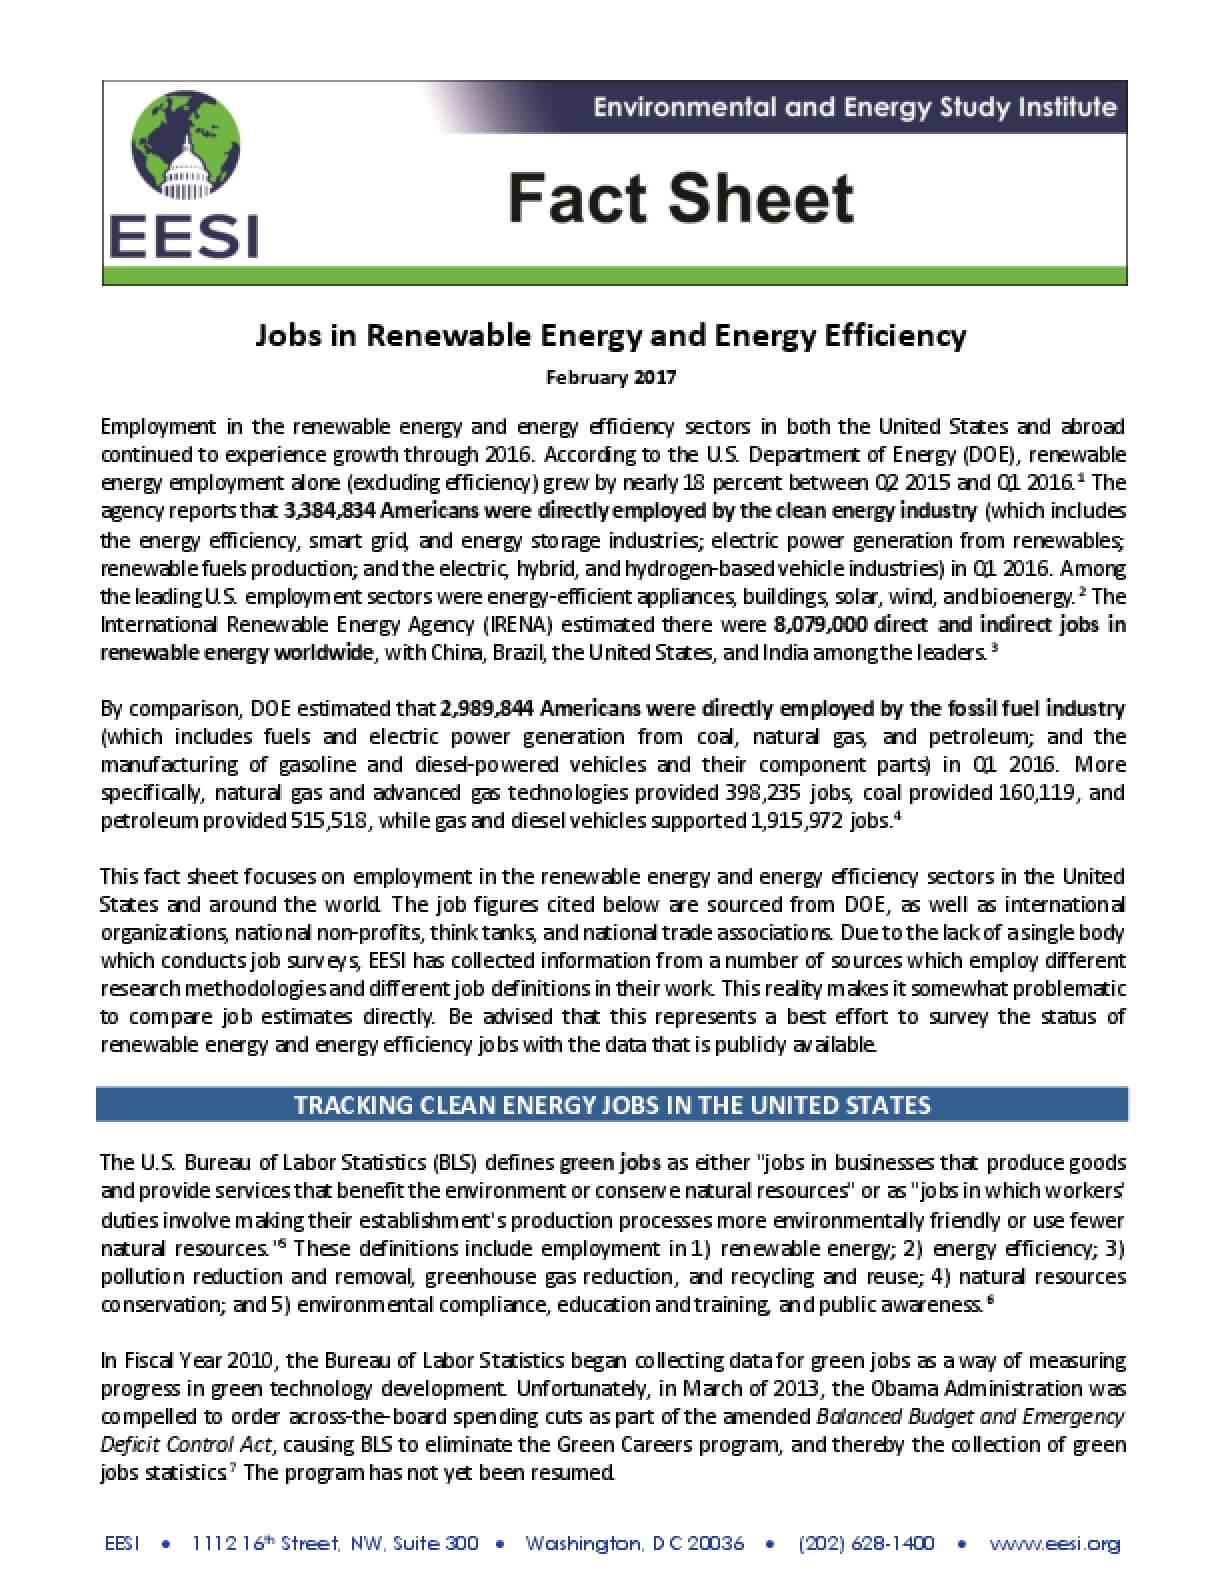 Fact Sheet: Jobs in Renewable Energy and Energy Efficiency (2017)